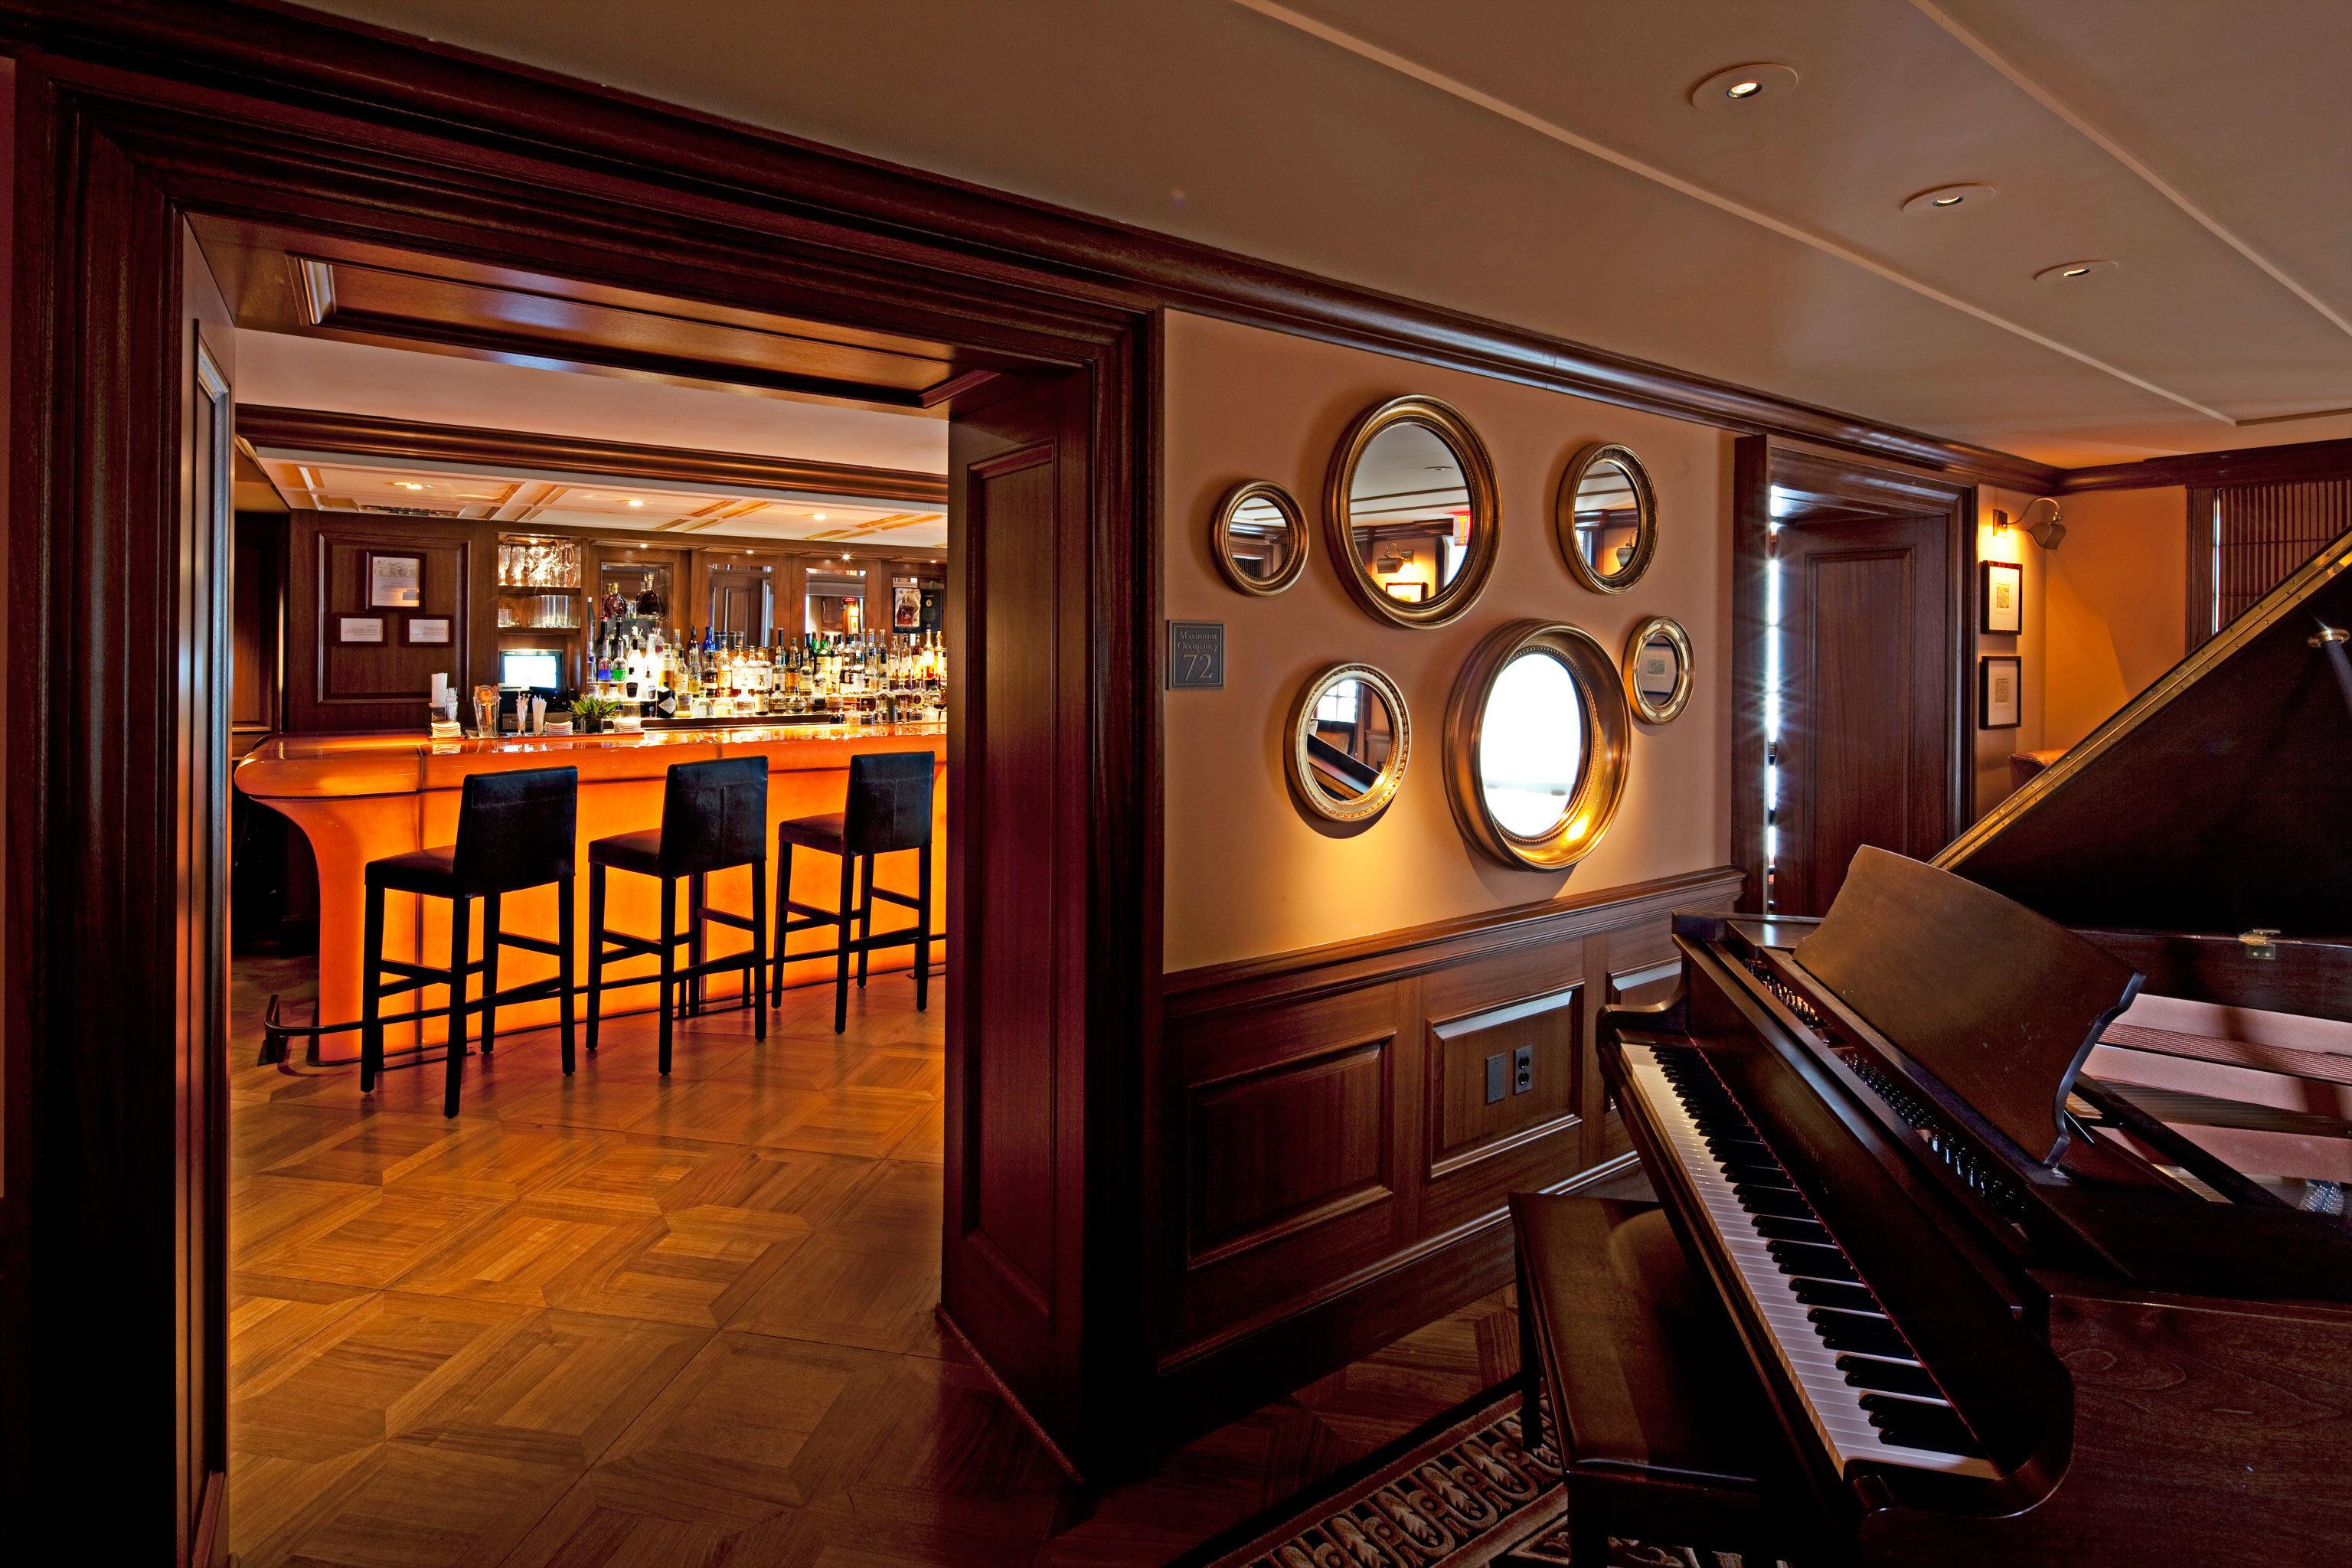 Bar Boutique Hotels Drink Hotels recreation room Lobby home mansion screenshot living room